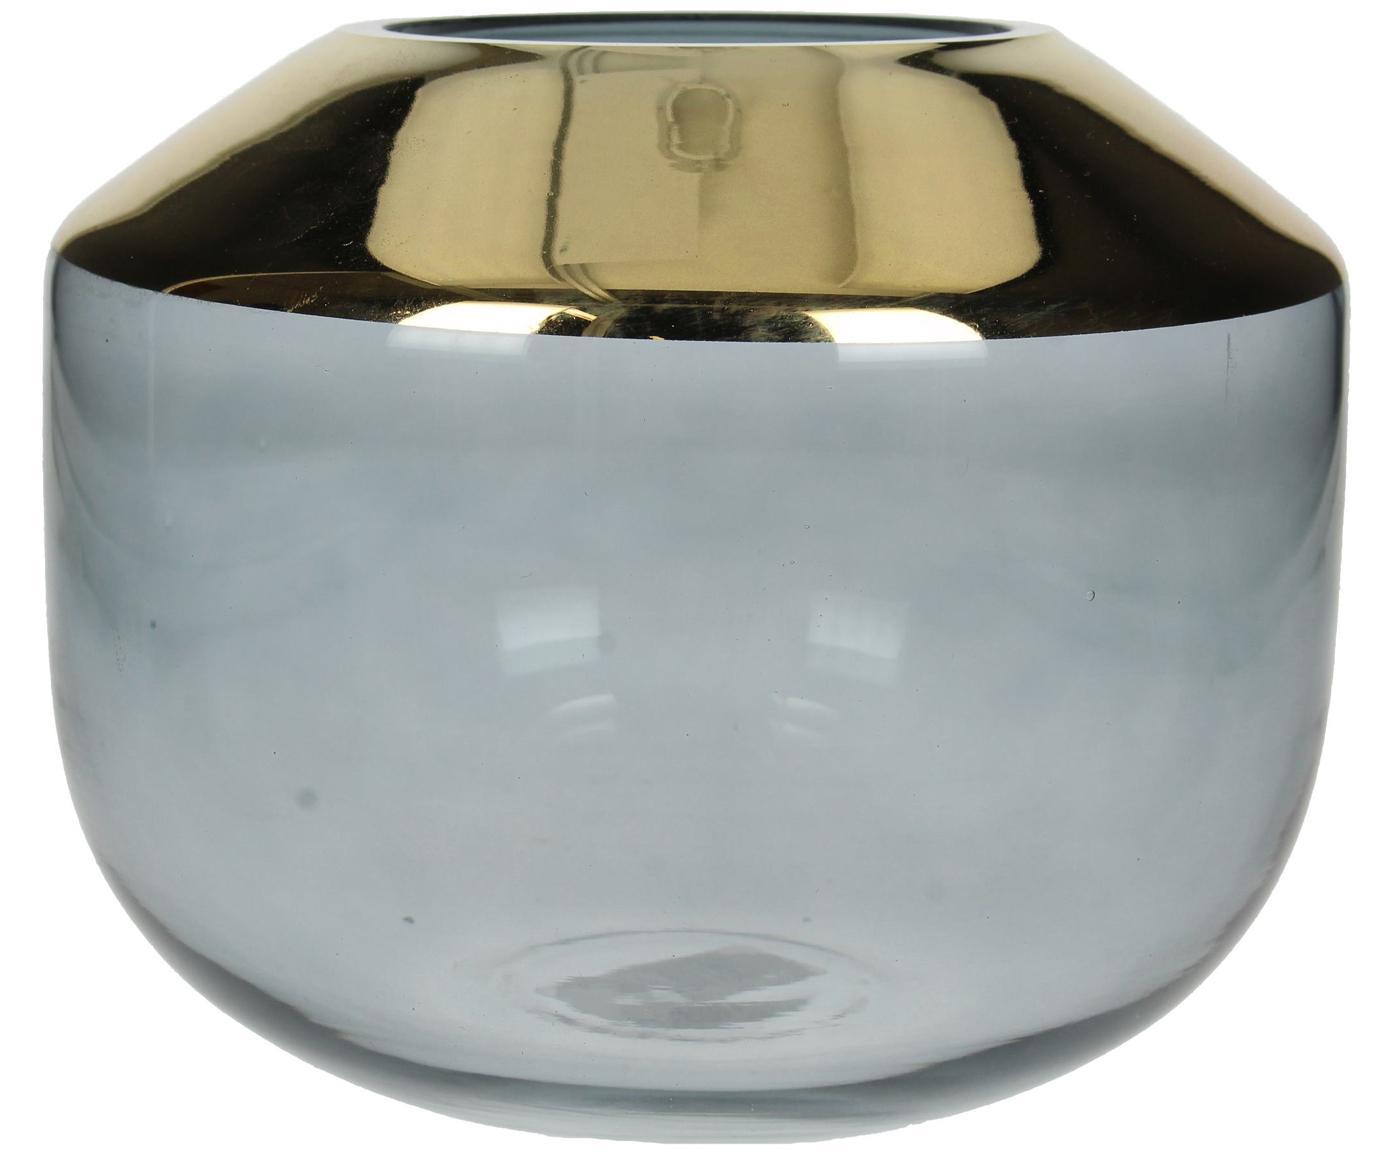 Glas-Vase Janak, Glas, Grau, transparent, Goldfarben, Ø 18 x H 15 cm